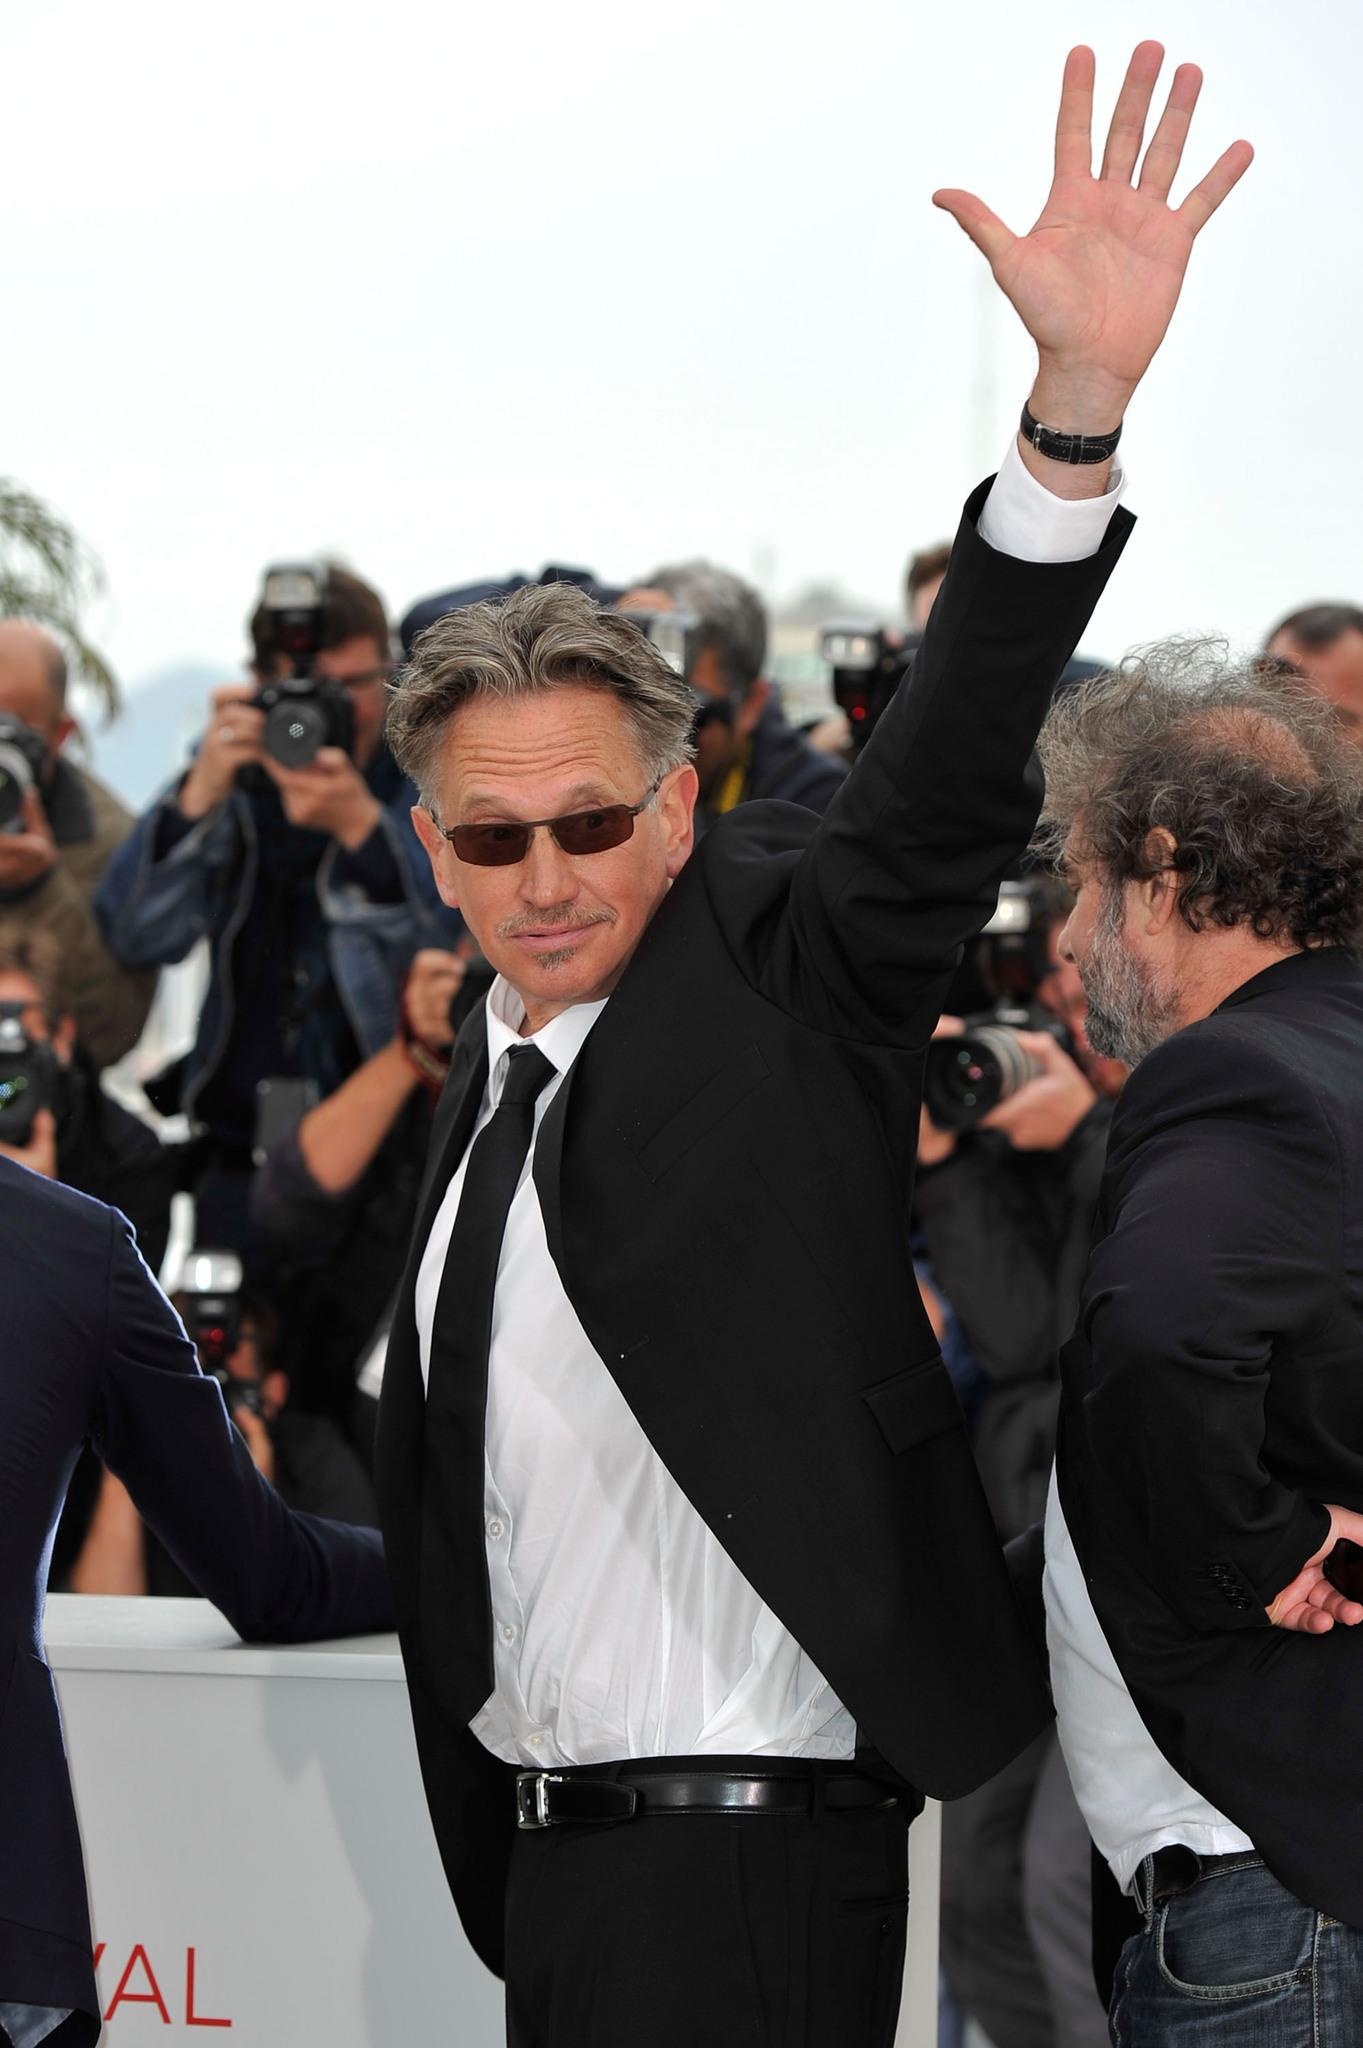 Benoît Delépine at an event for Le grand soir (2012)